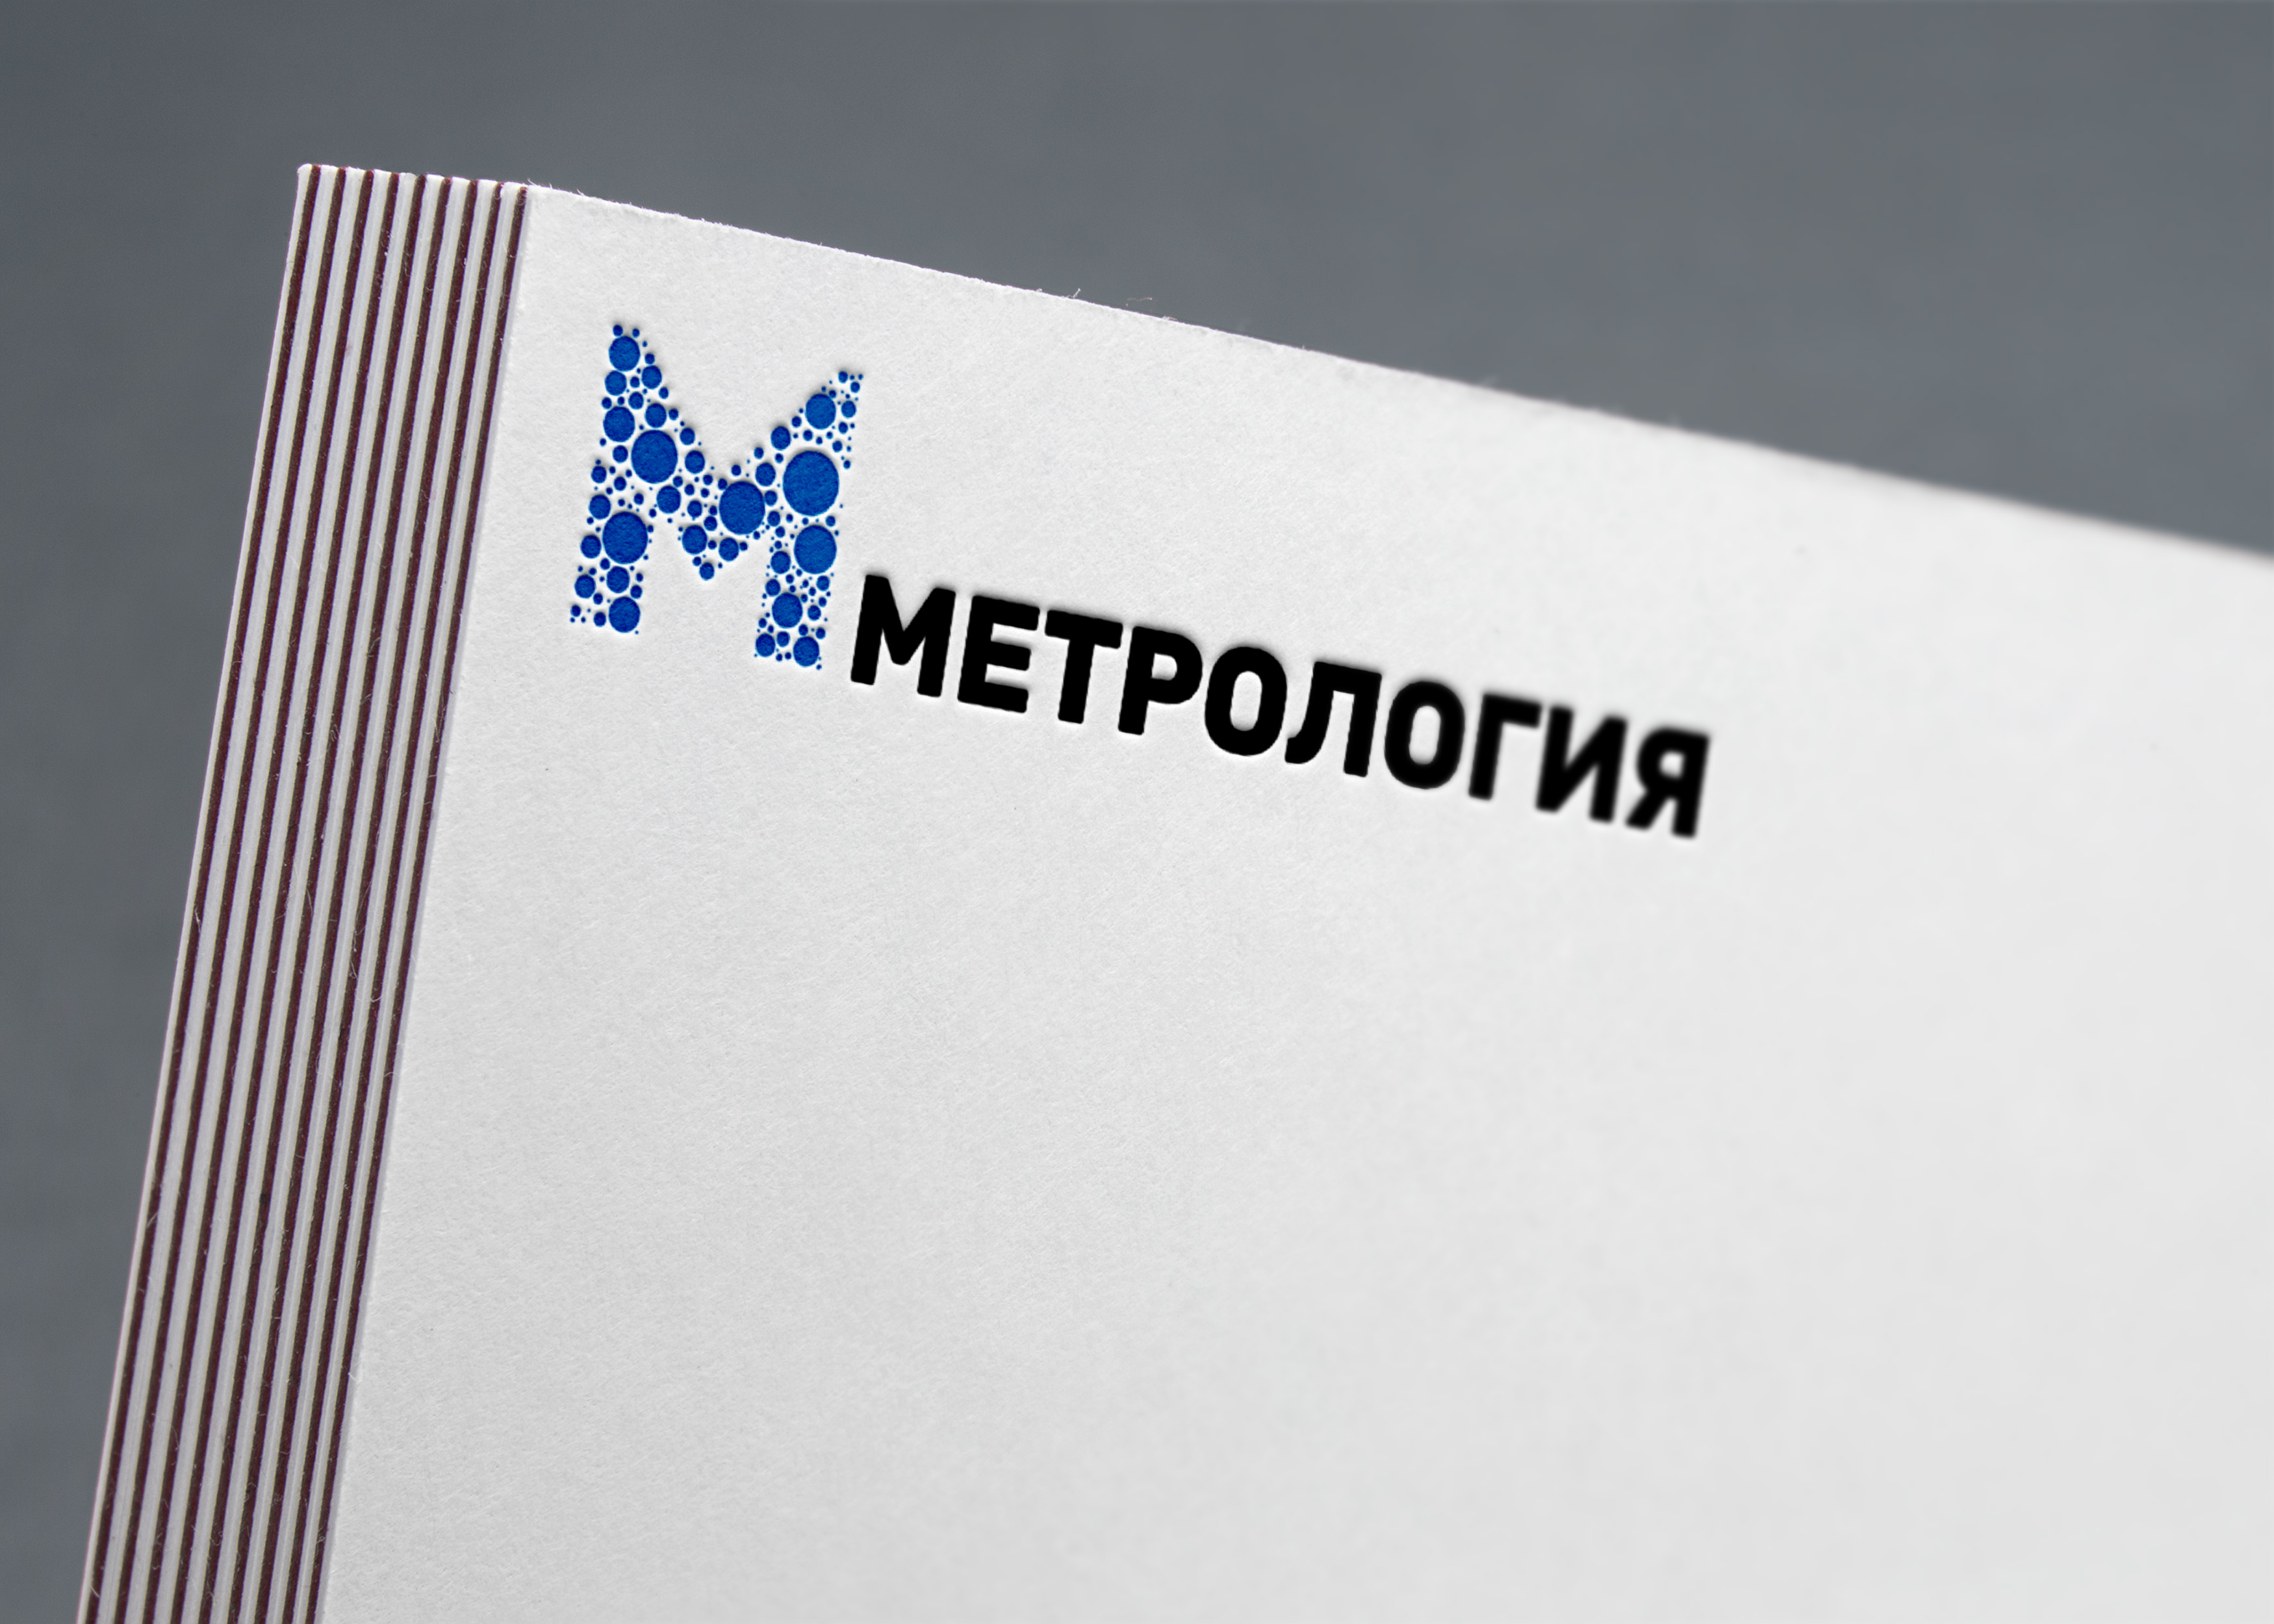 Разработать логотип, визитку, фирменный бланк. фото f_29258f400d621bac.jpg